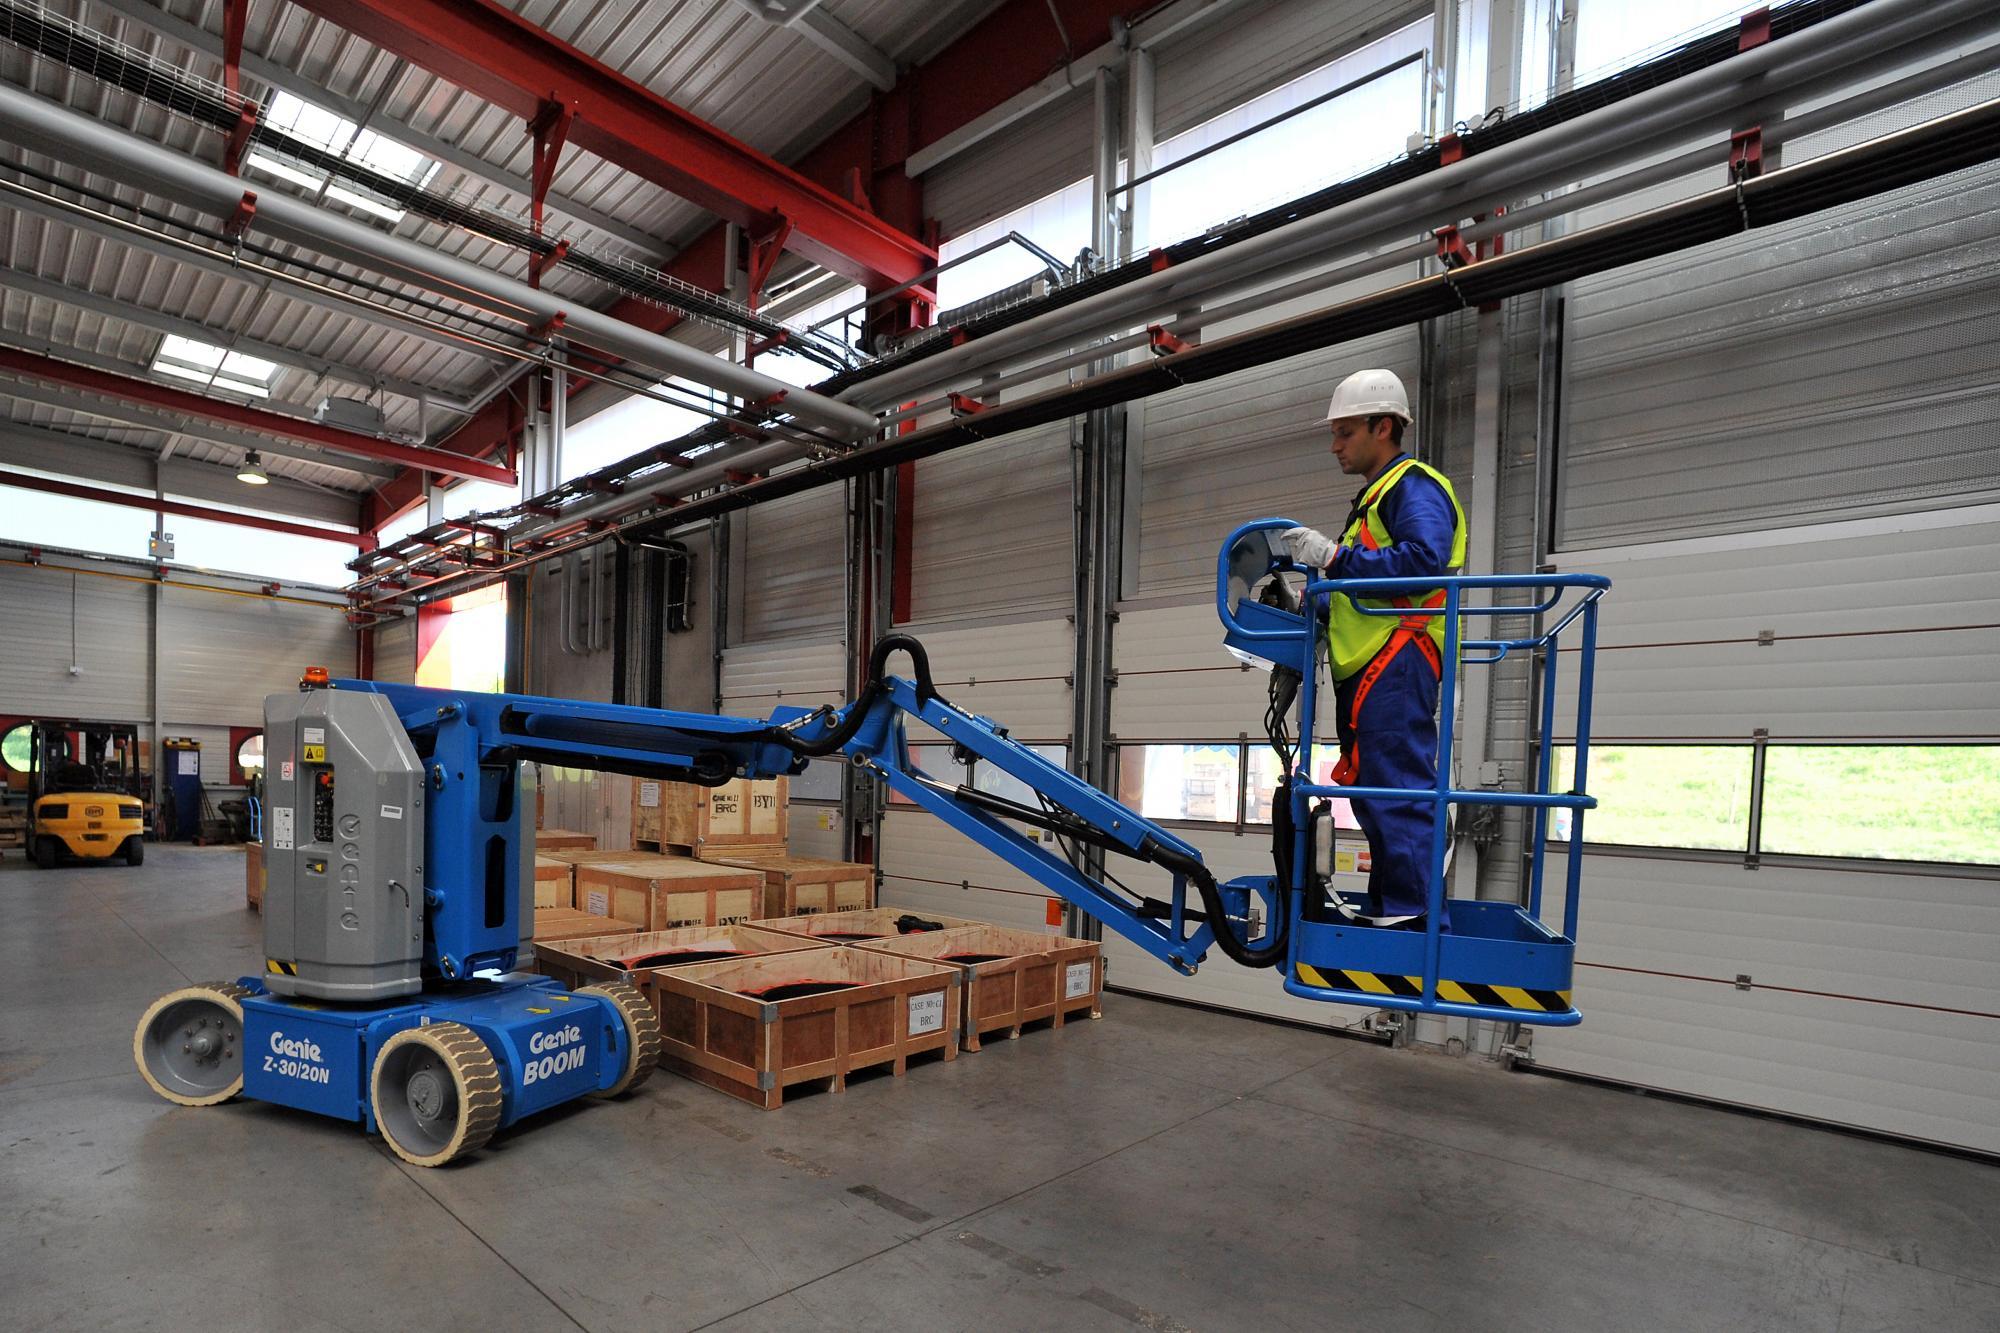 Genie® Z30/20NRJ (Narrow Rotating JIB) Articulated Boom Lift